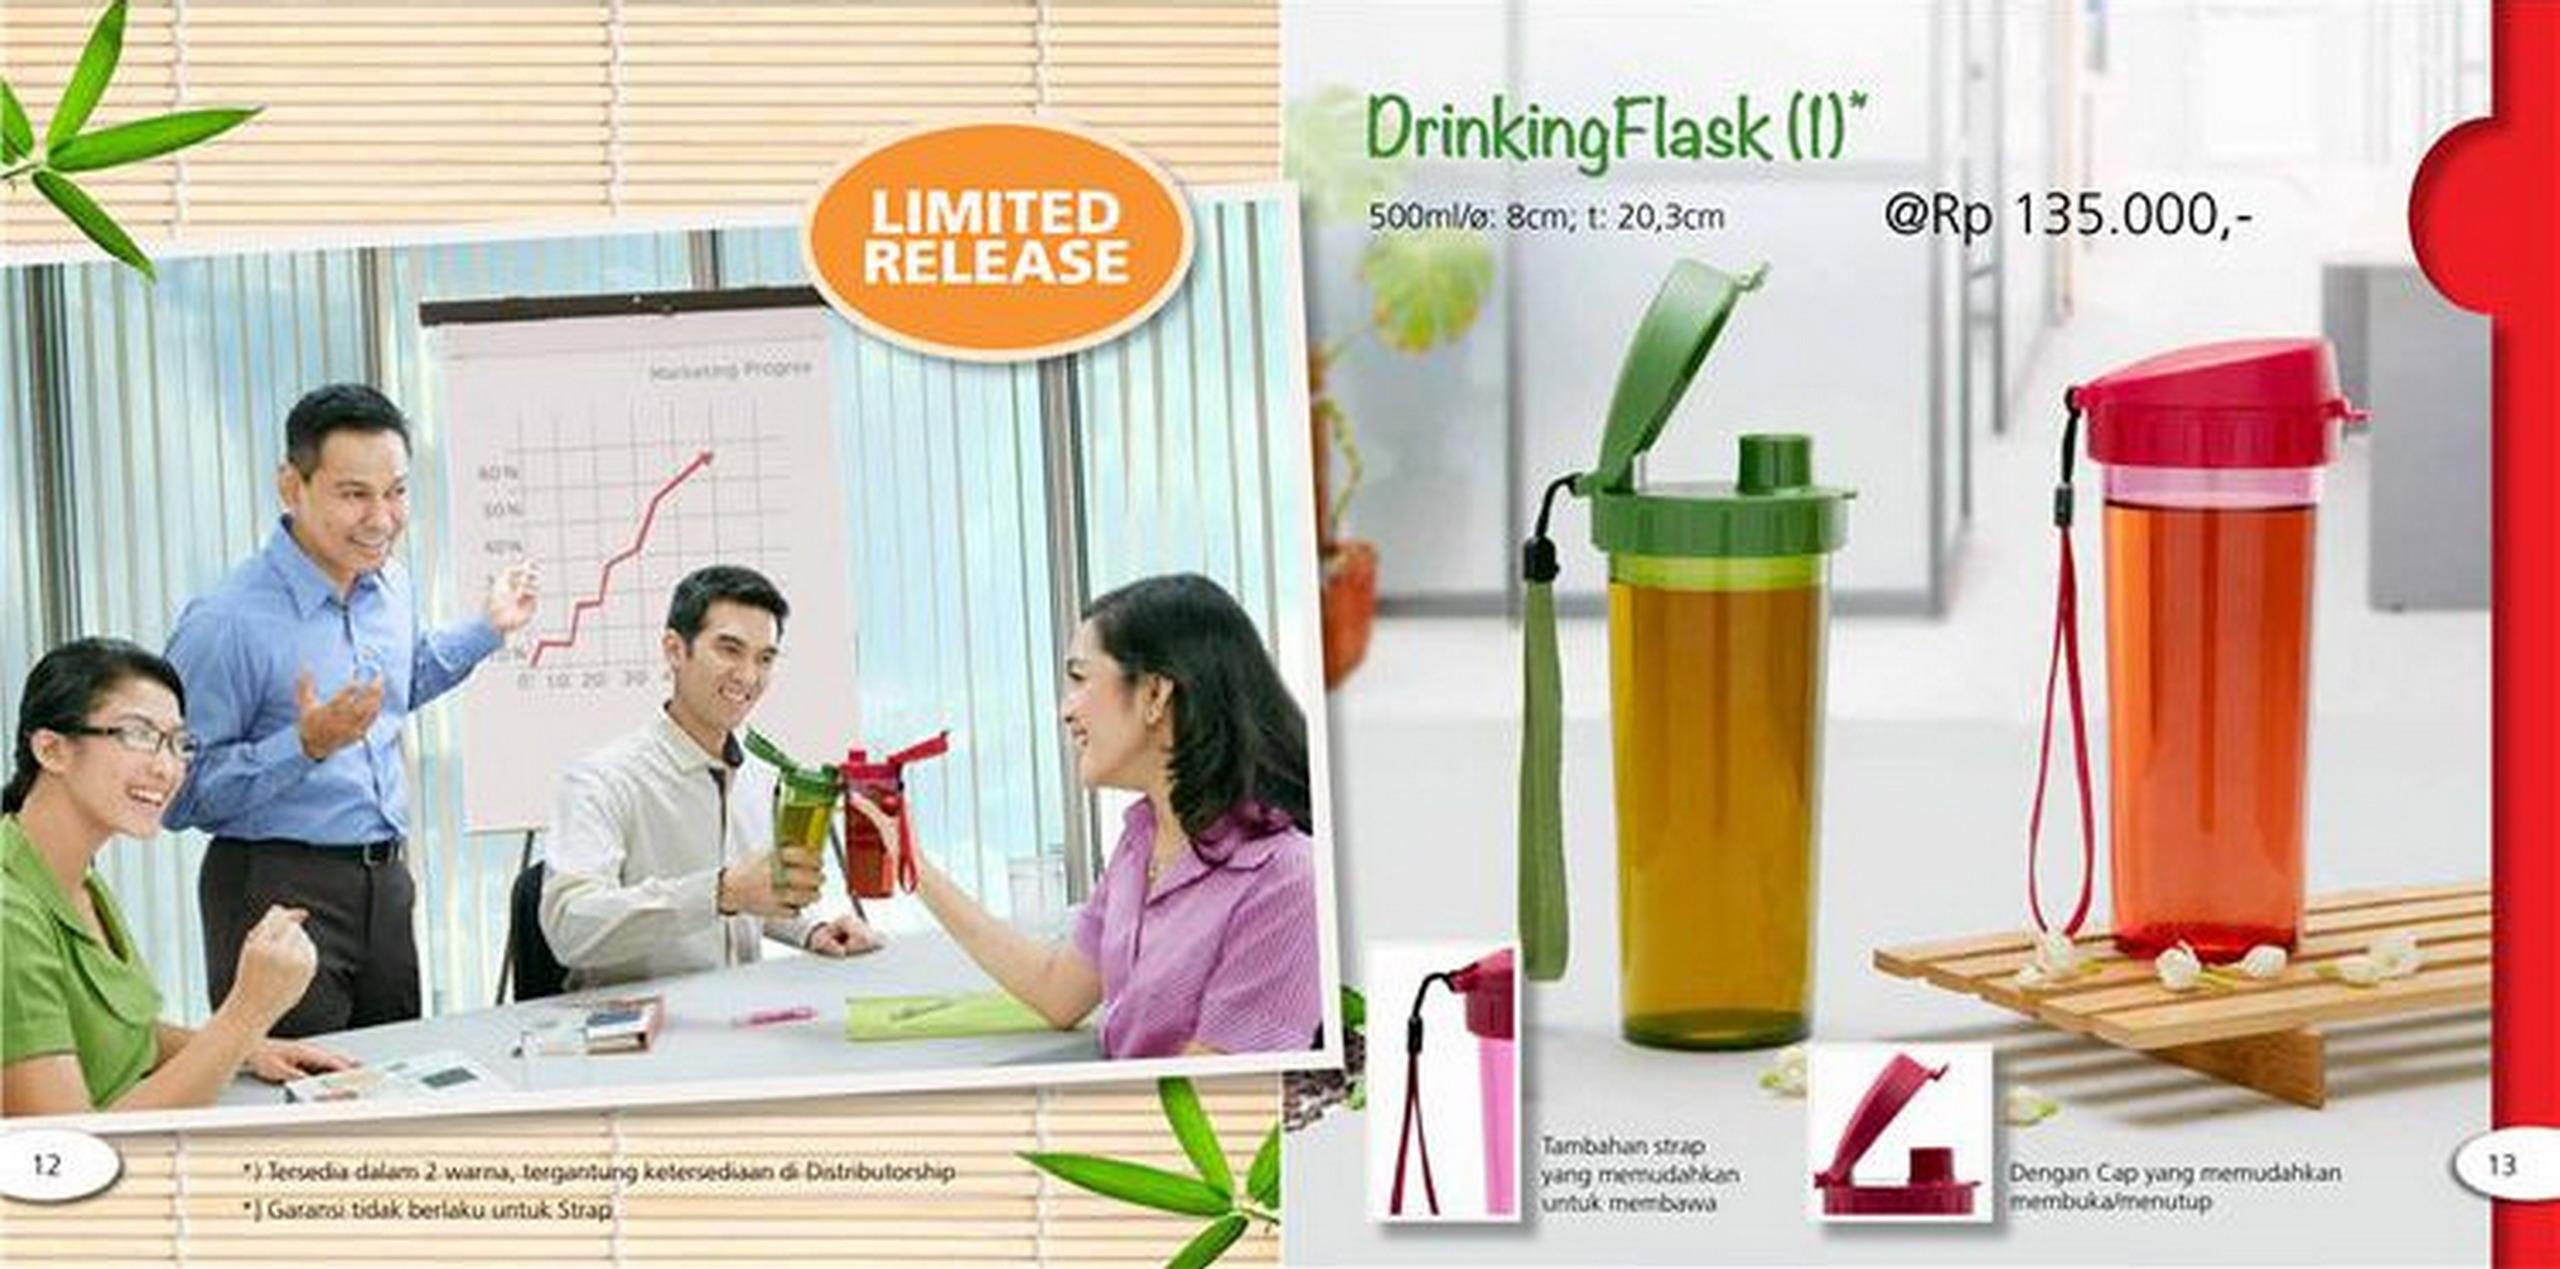 http://freetupperware.files.wordpress.com/2013/08/tupperware-drinking-flask.jpg